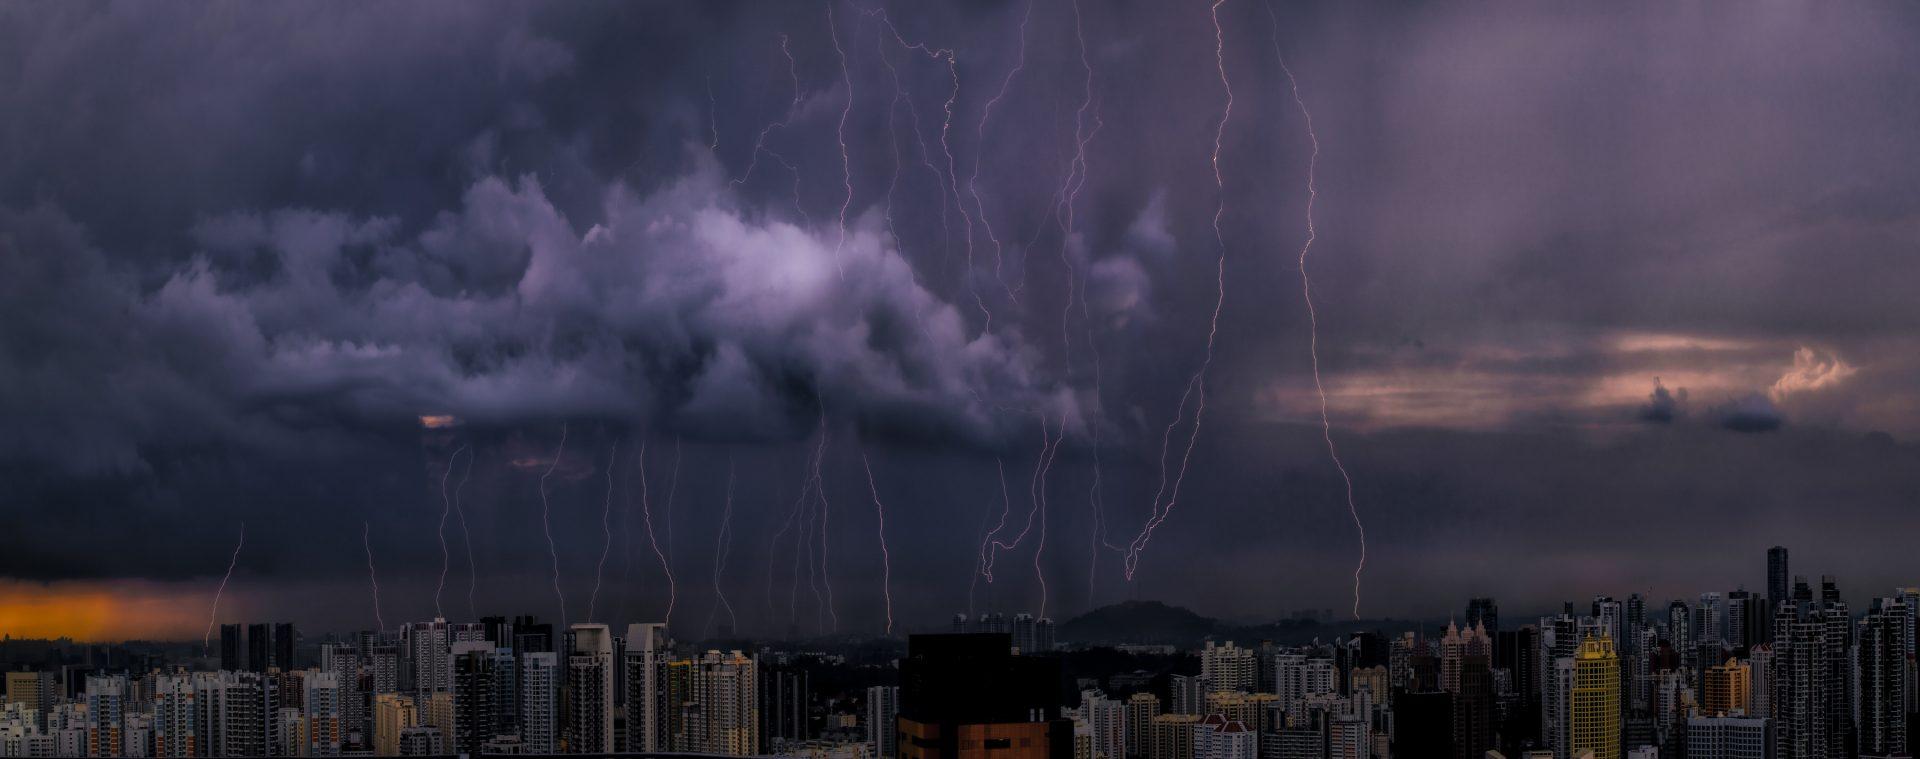 Thunderstorm. Singapore 19-06-2021 NW